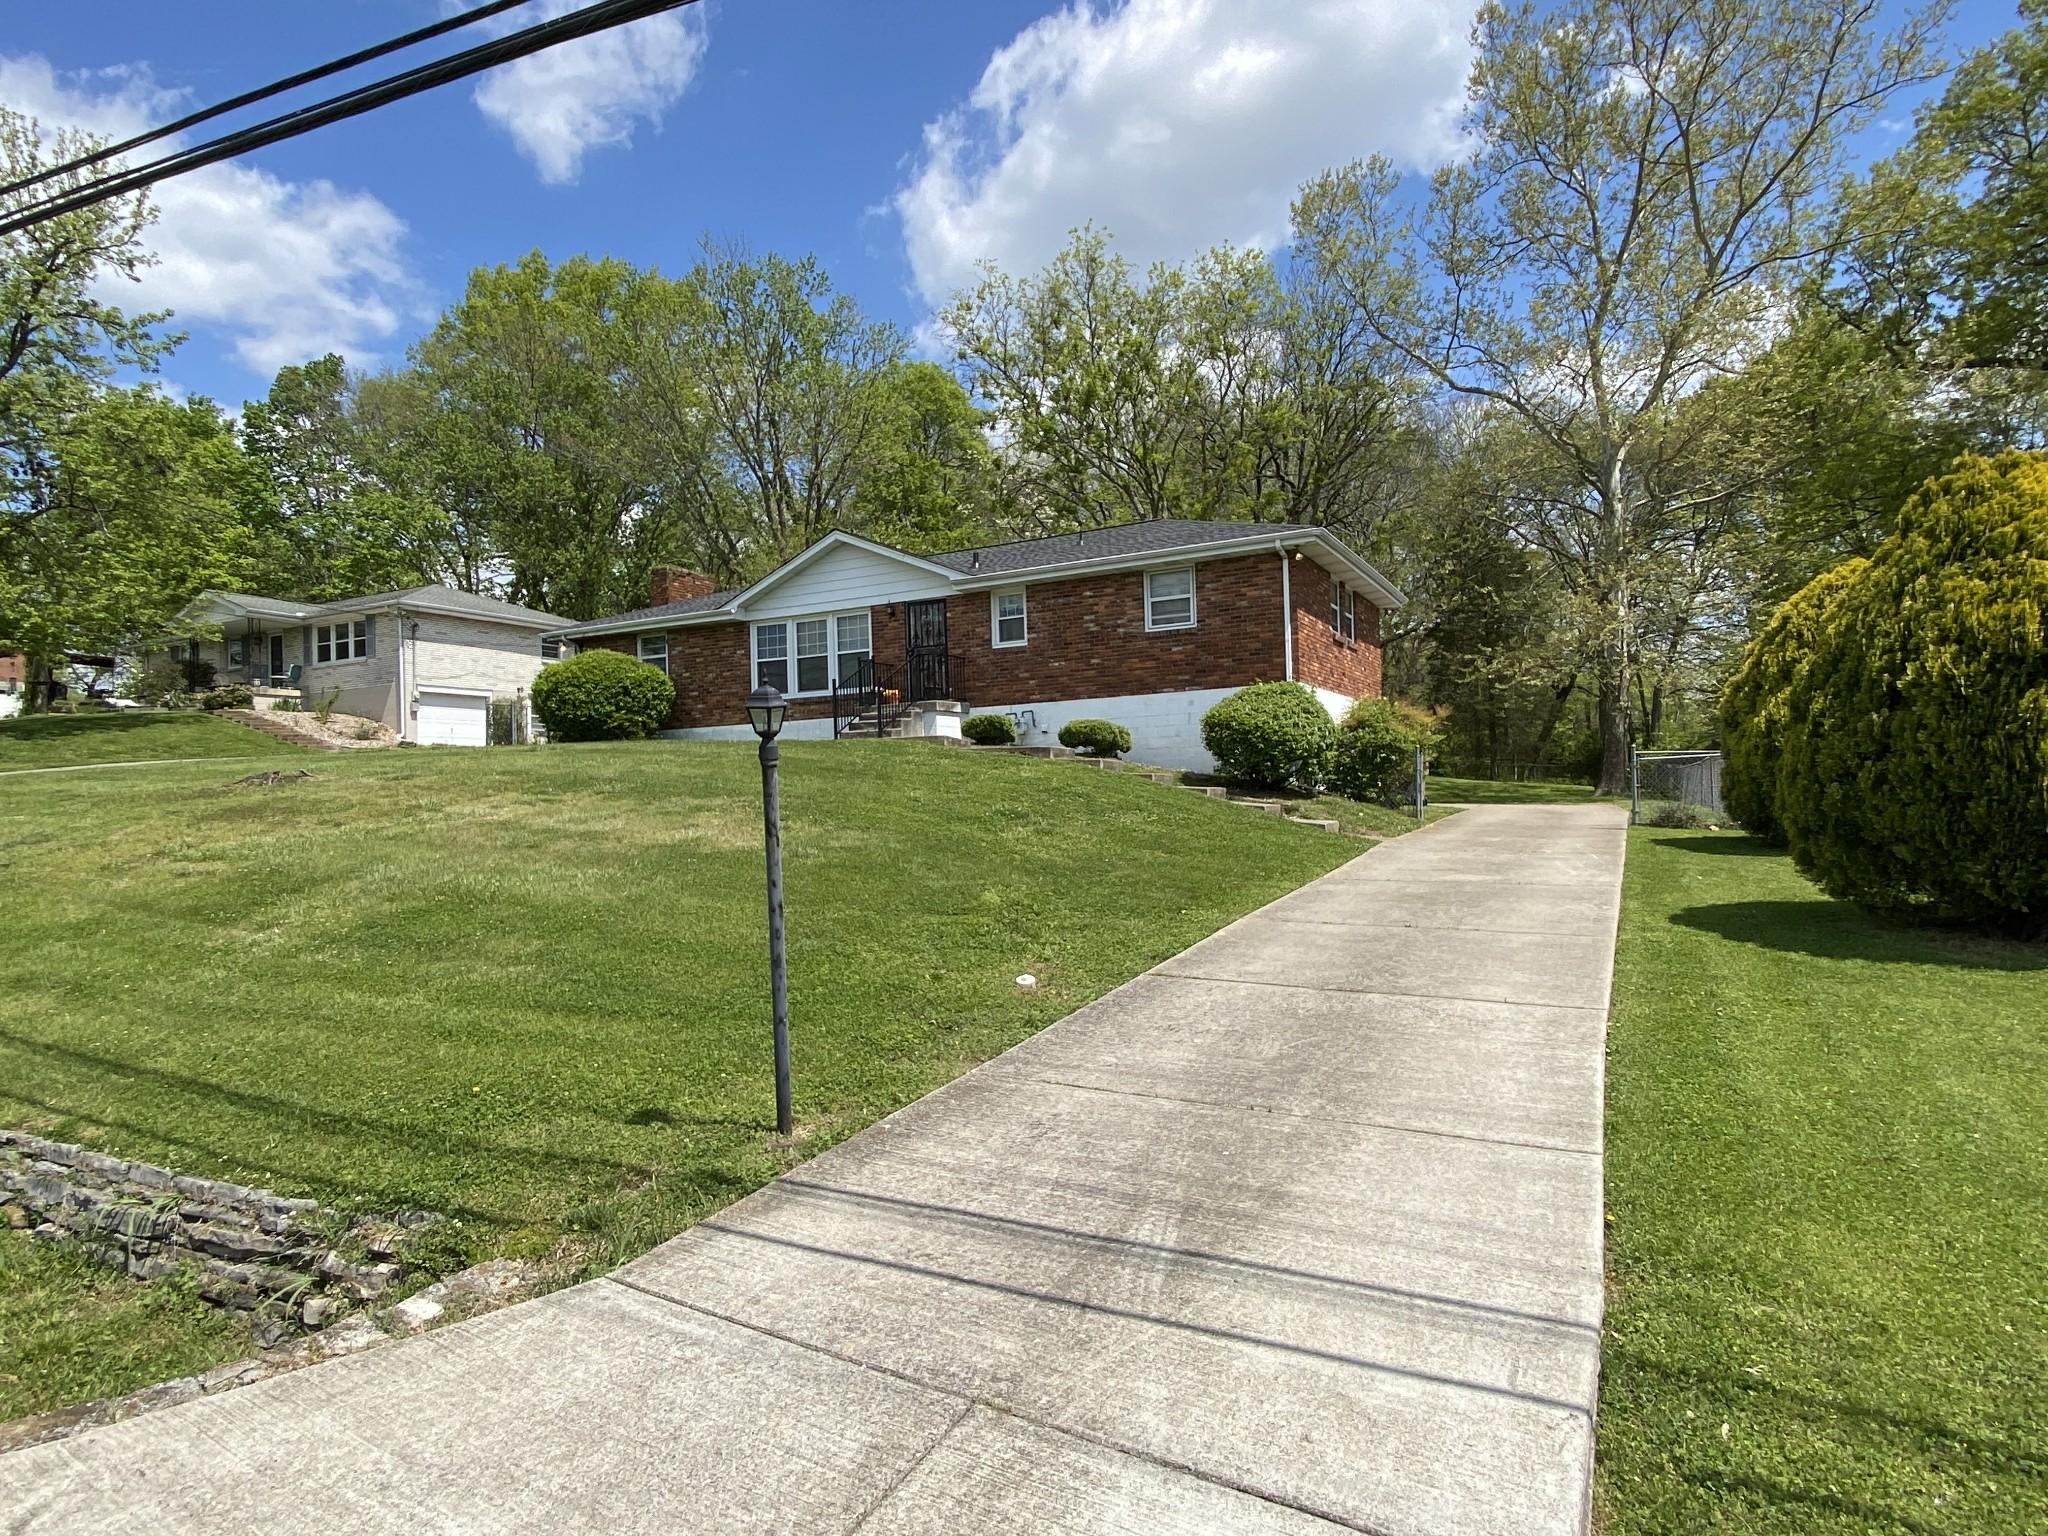 604 Glenpark Dr Property Photo - Nashville, TN real estate listing